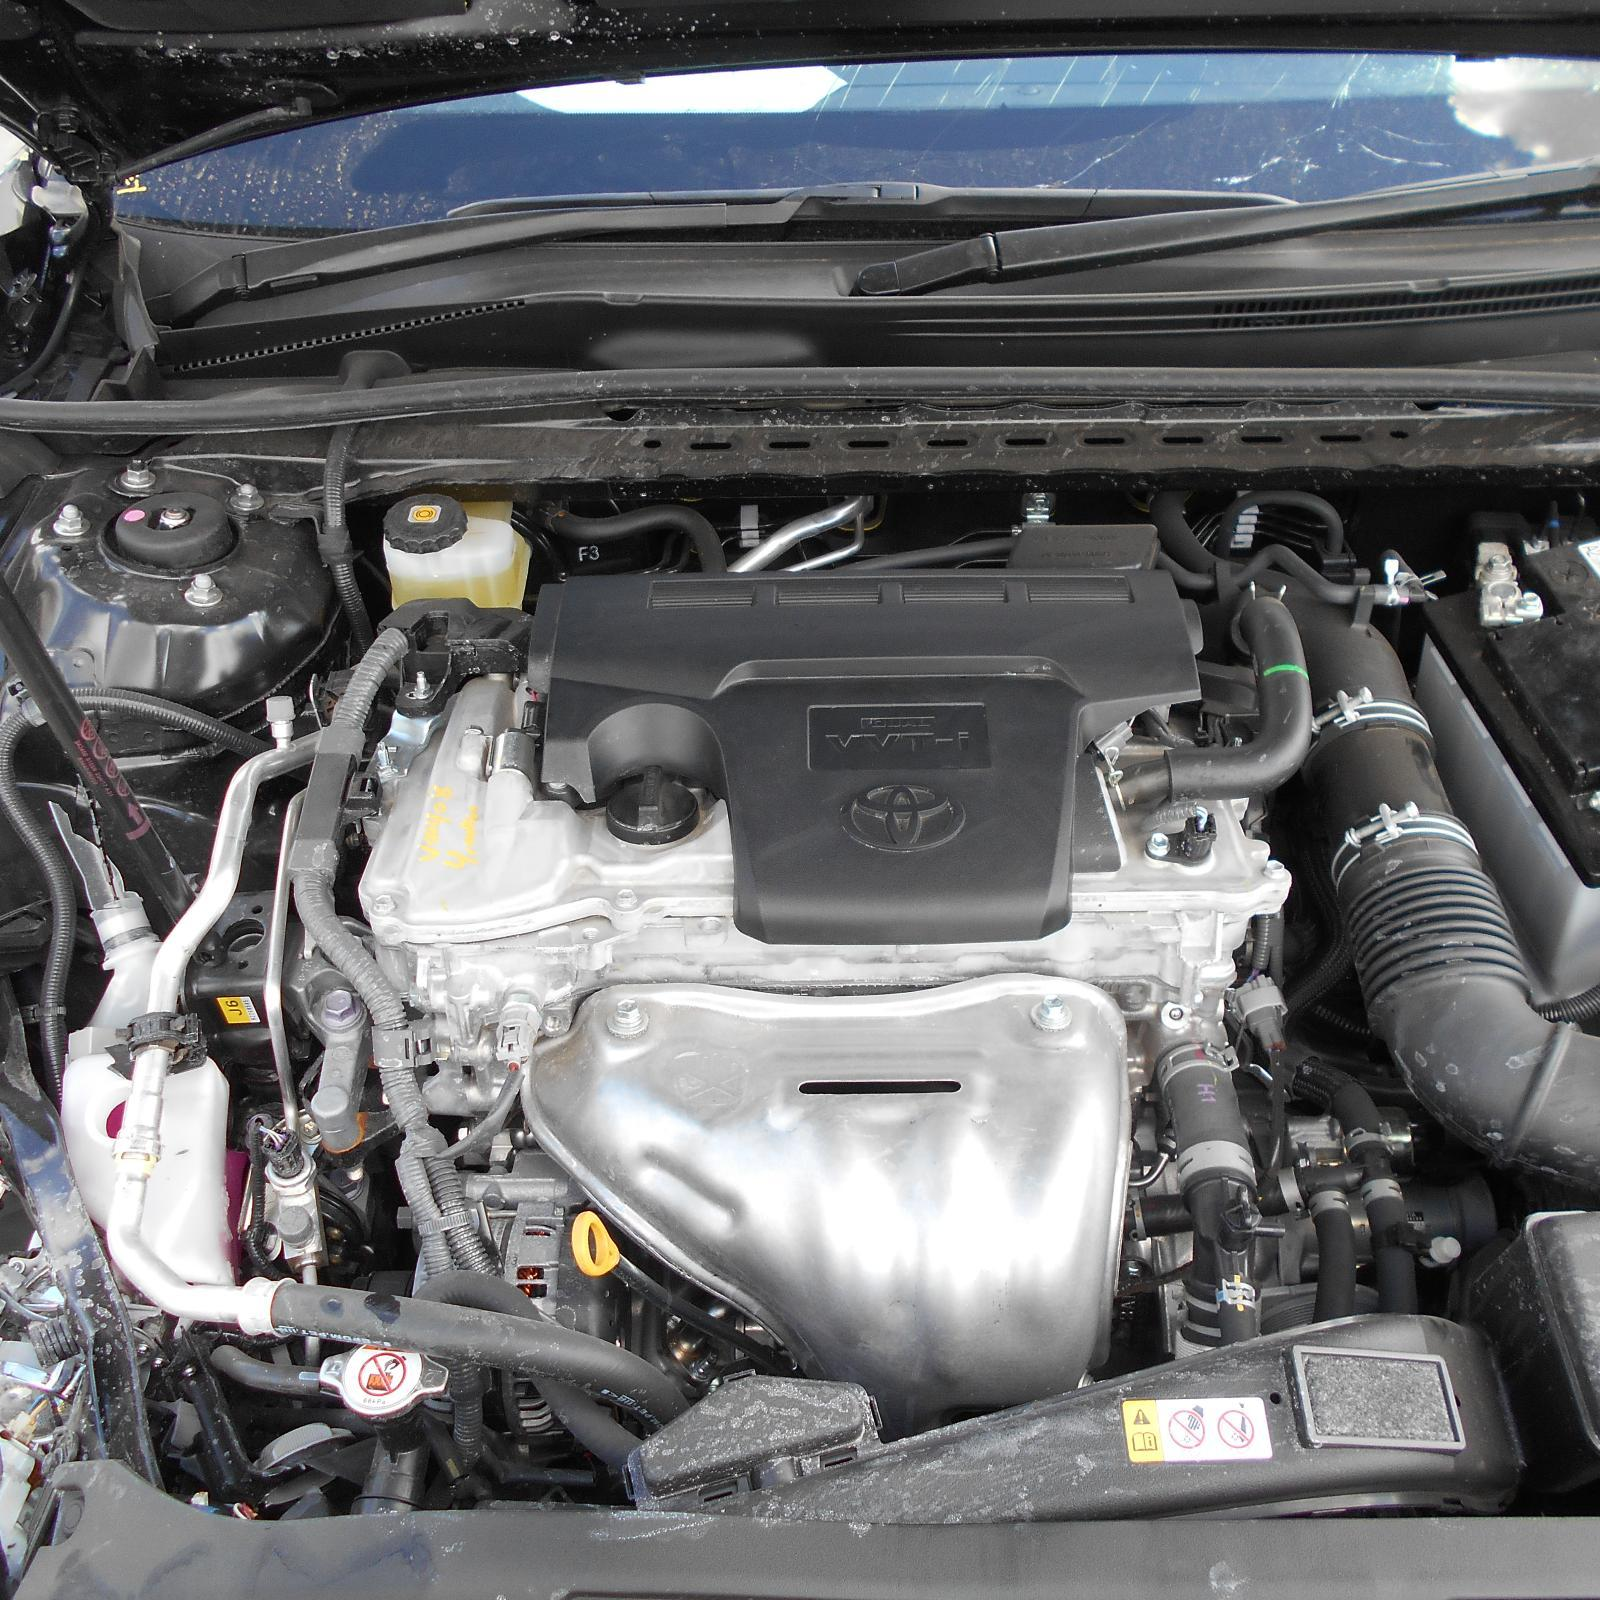 TOYOTA CAMRY, Engine, PETROL, 2.5, 2AR-FE, XV70, 09/17-